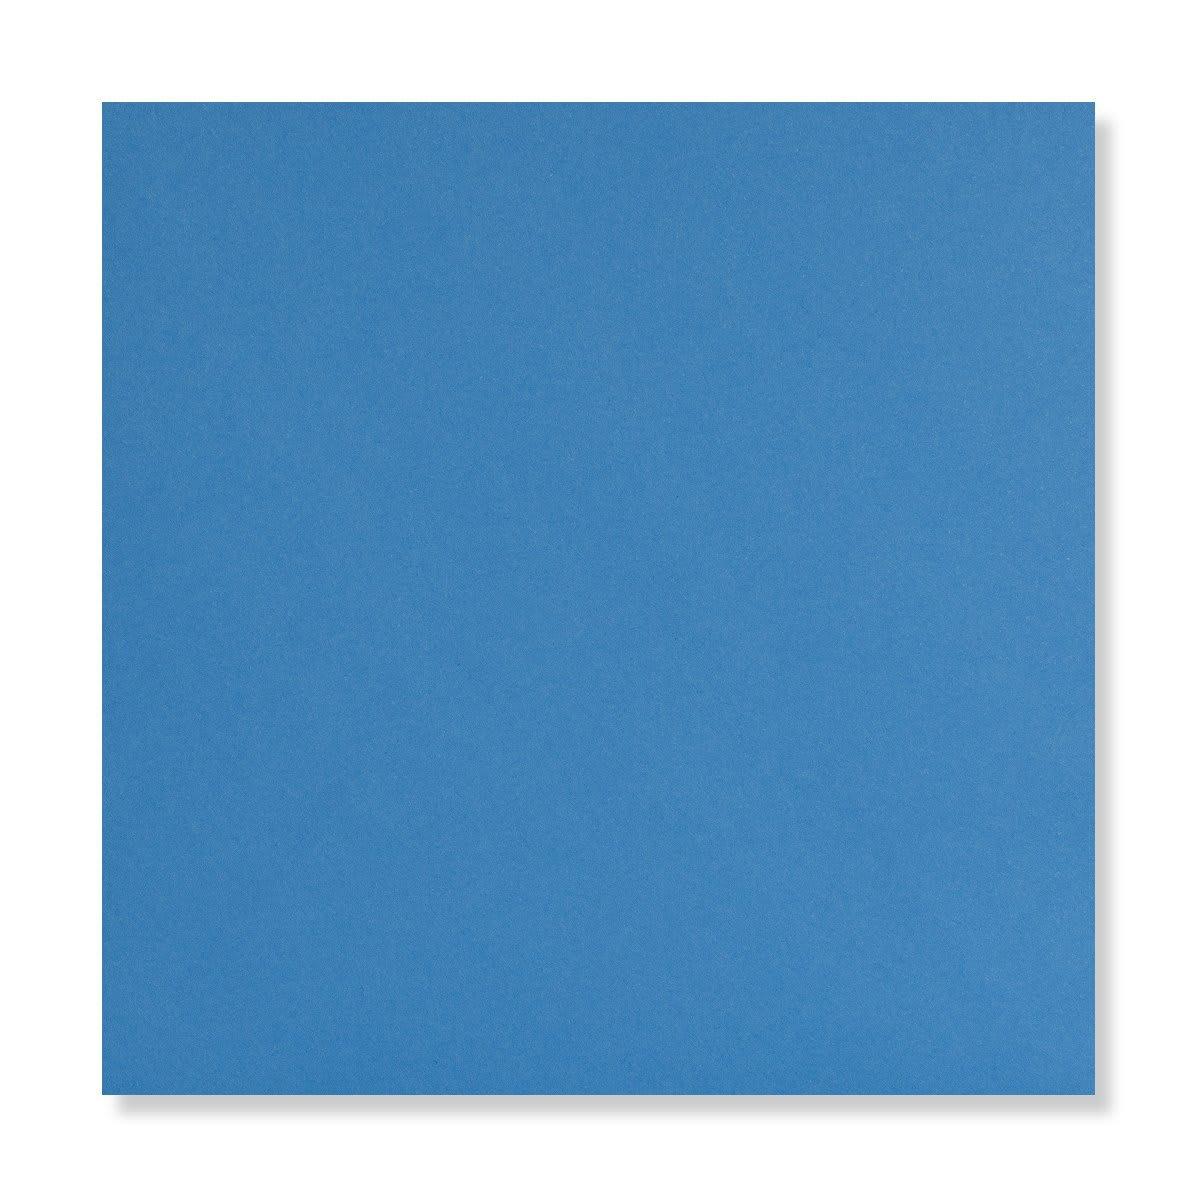 BRIGHT BLUE 155mm SQUARE ENVELOPES 120GSM